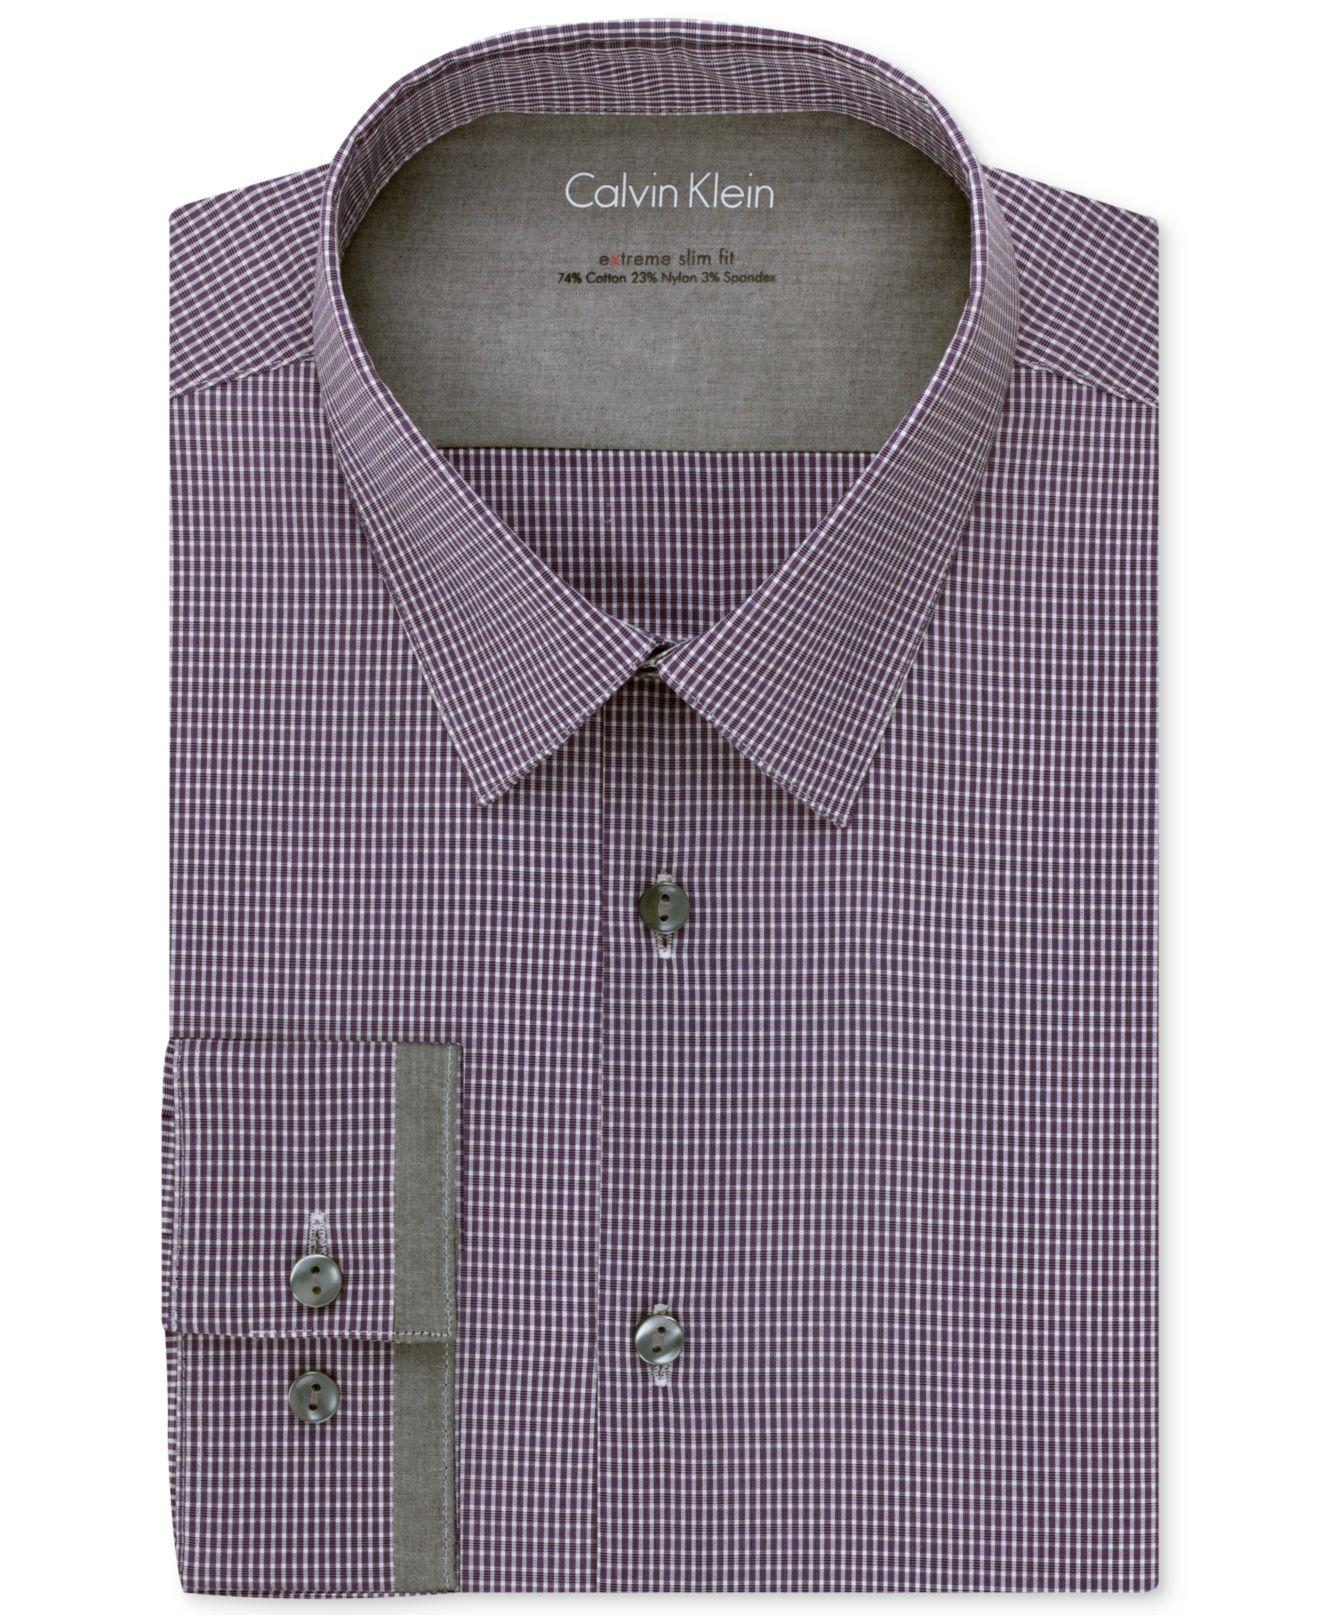 Calvin klein x extra slim fit stretch check dress shirt in for Extra slim dress shirt